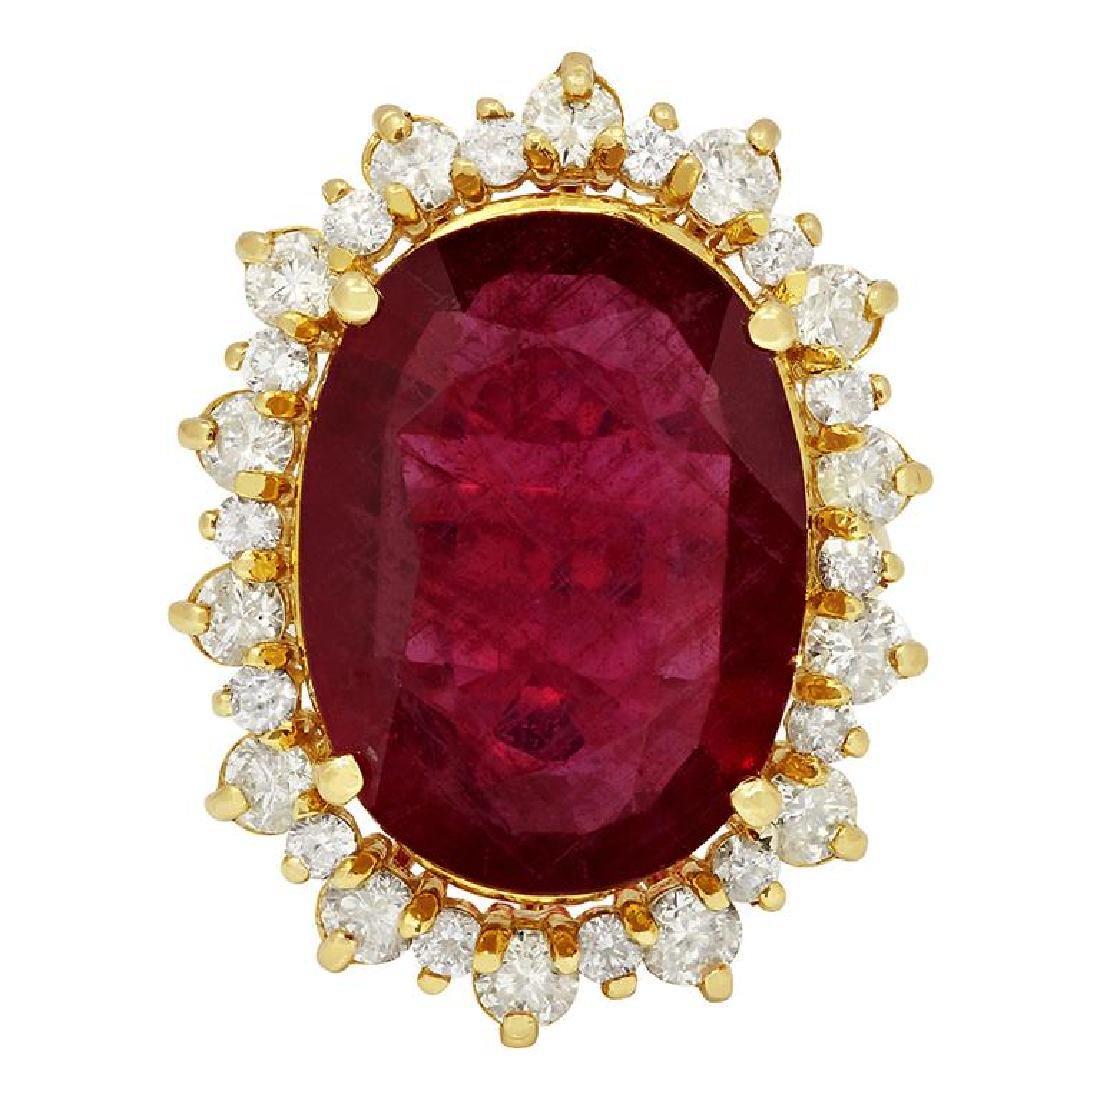 14k Yellow Gold 14.90ct Ruby 2.13ct Diamond Ring - 3